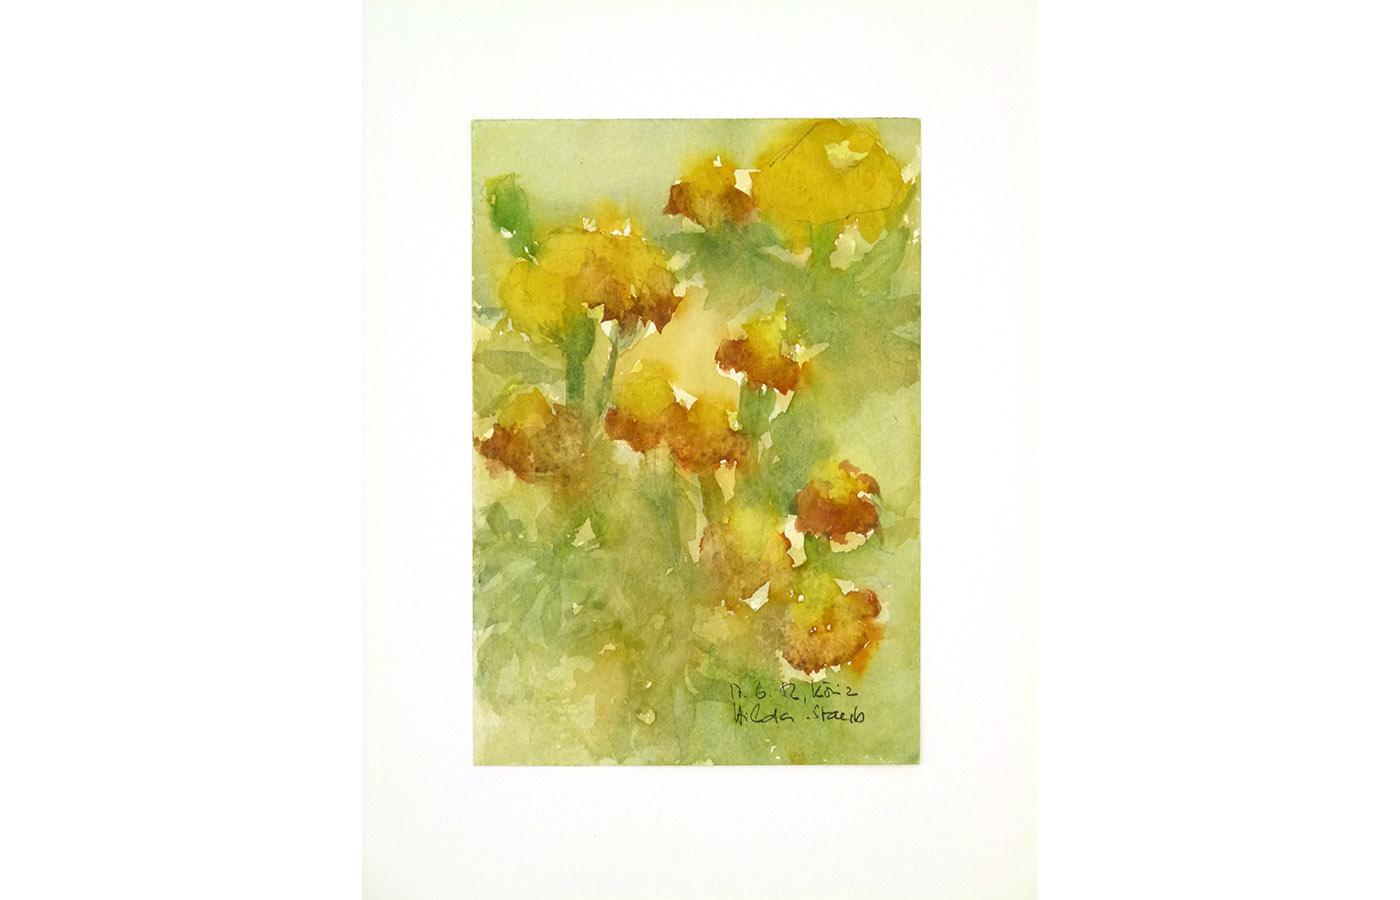 Blumen_0023_L1100435a